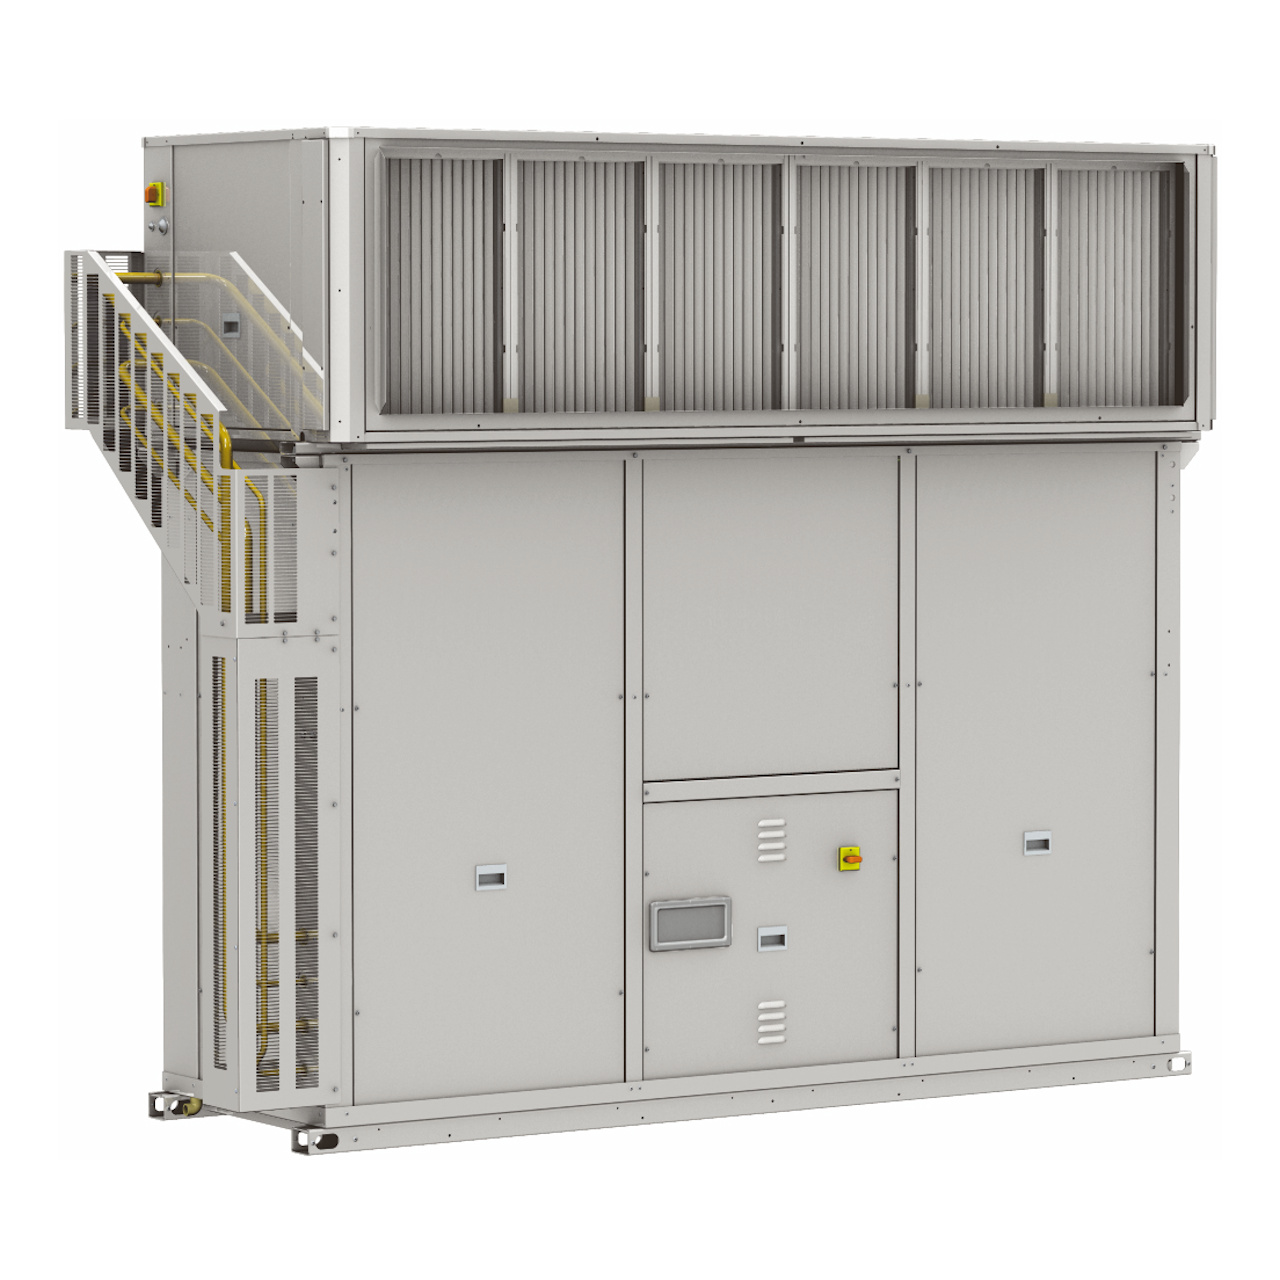 carrier-50NI-modular-compact-heat-pump